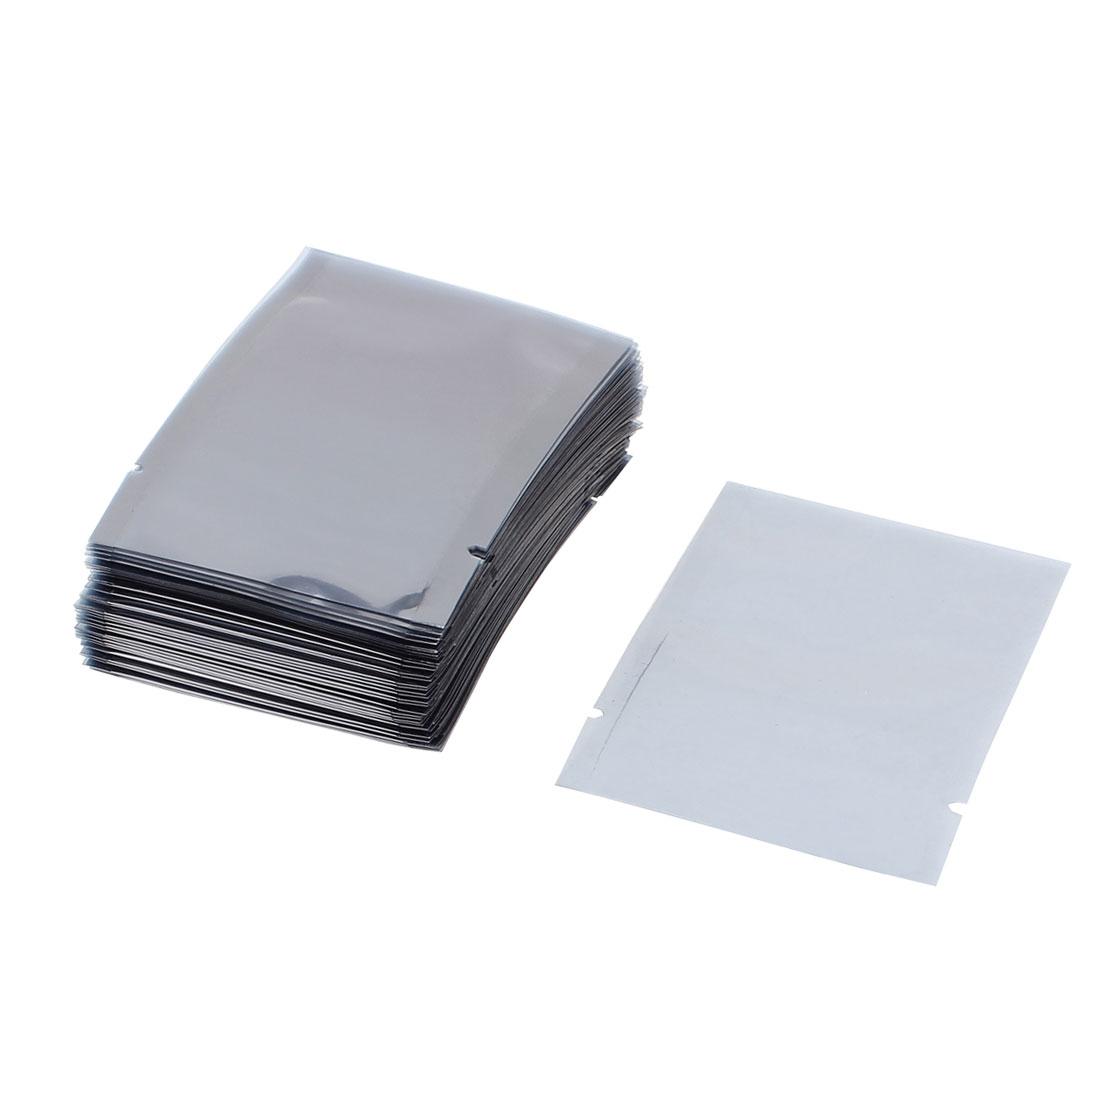 100 Pcs 60mm x 80mm Silver Tone Flat Open Top Anti Static Bag For Electronics